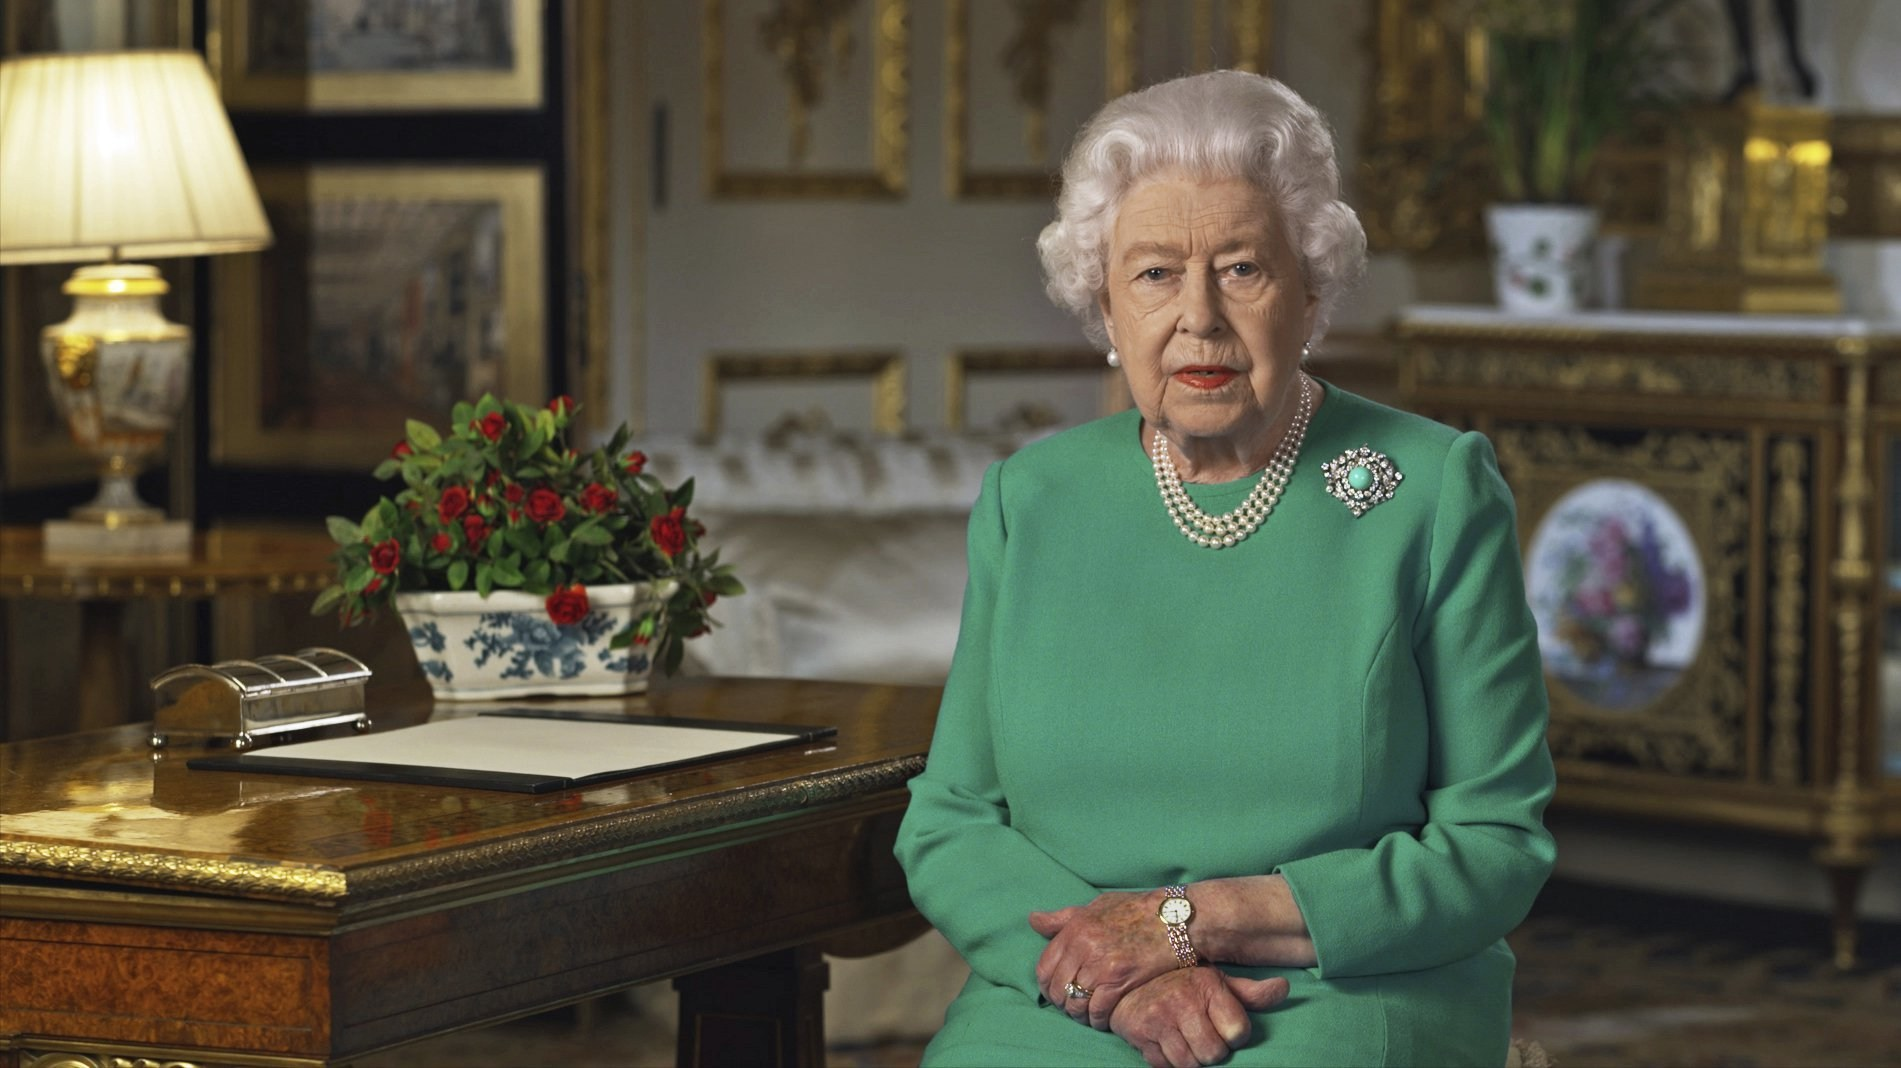 Queen declares UK 'will succeed' in coronavirus battle as she calls for wartime spirit